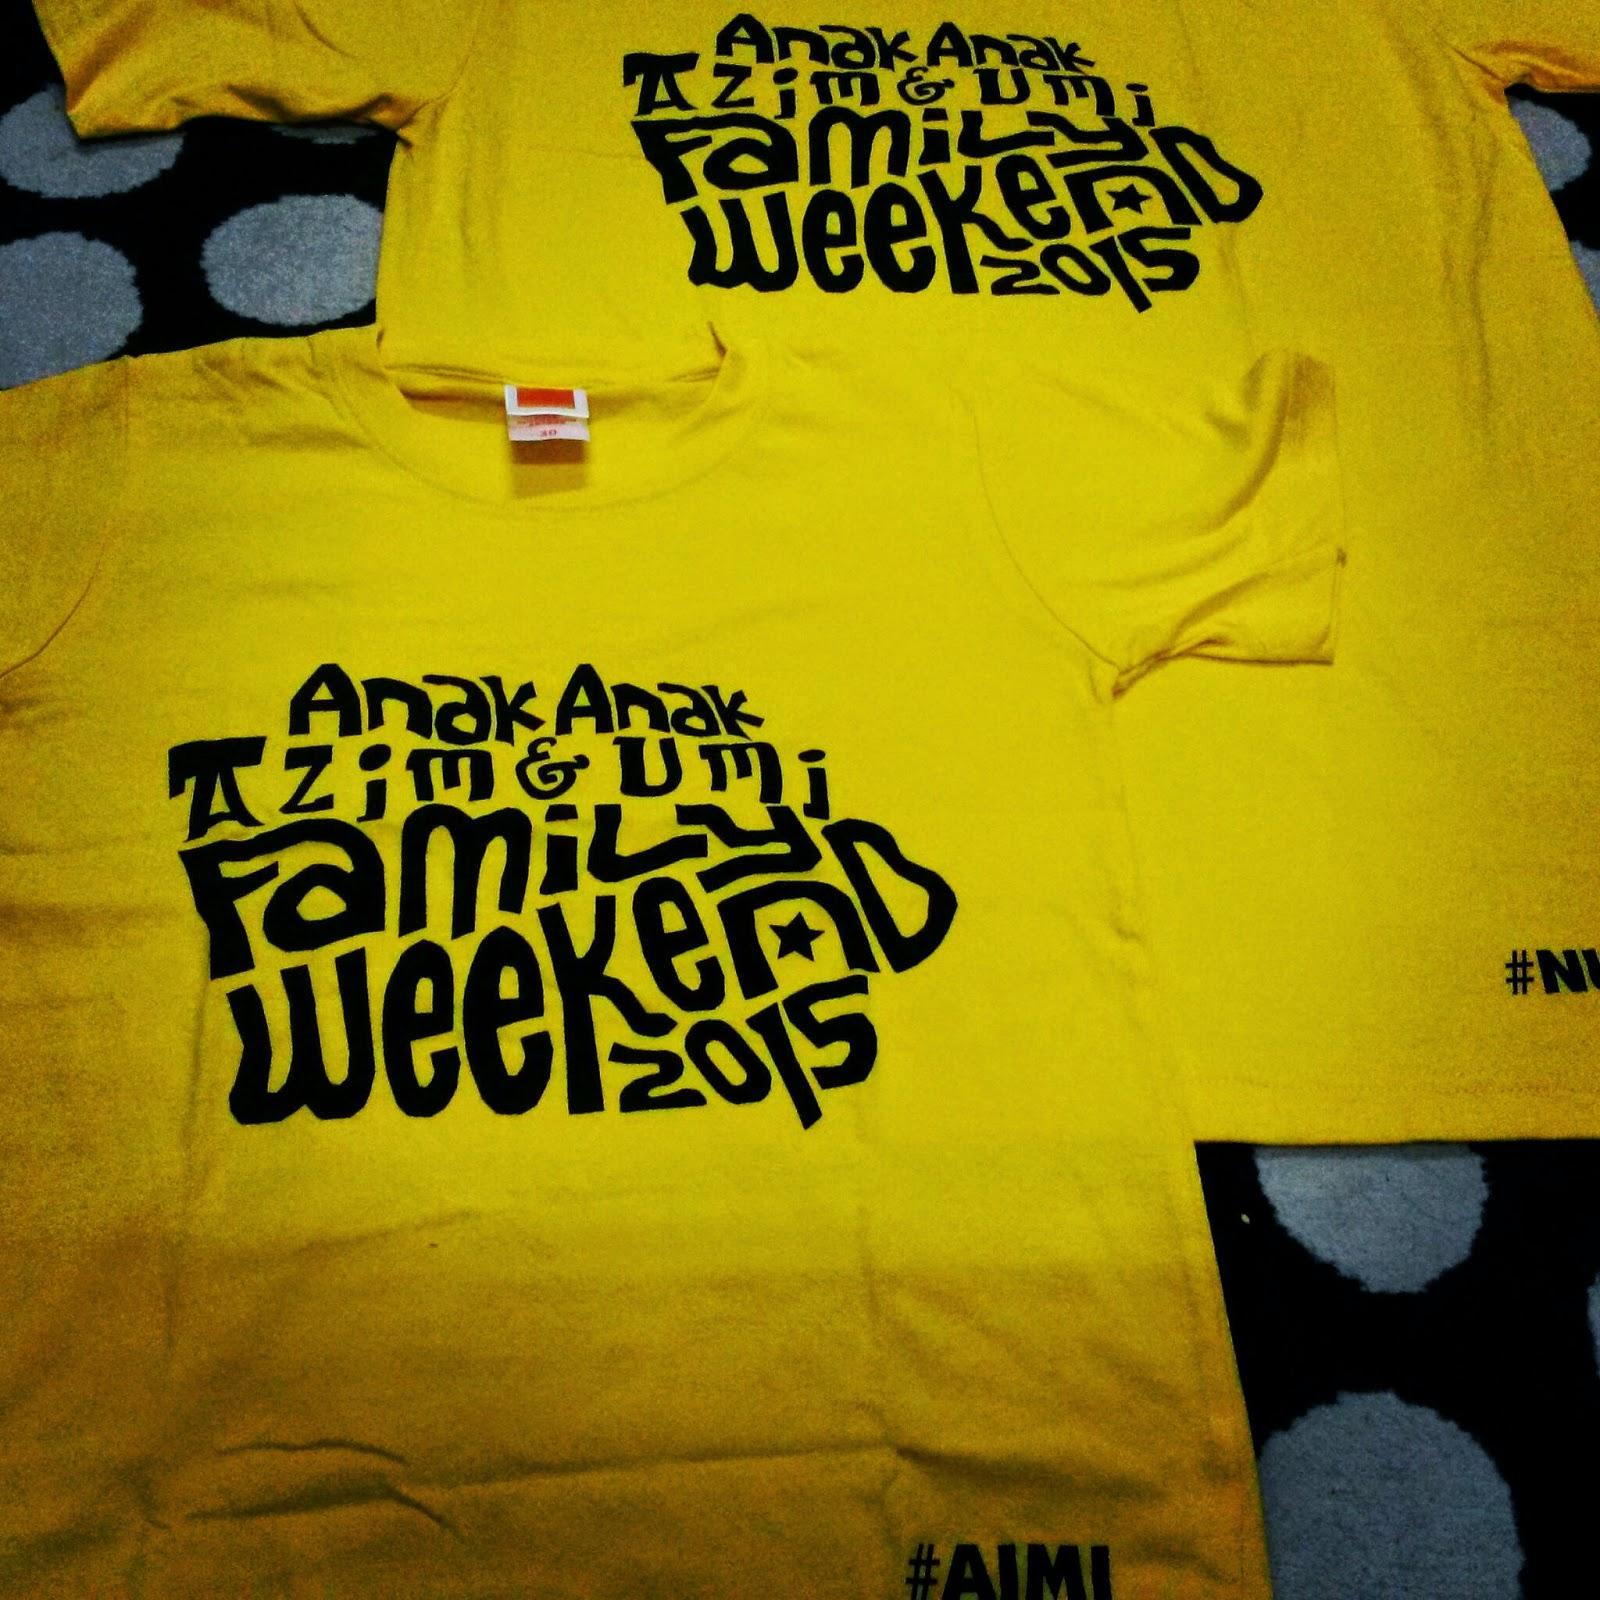 Design t shirt rewang - Design T Shirt Family Day Design Tshirt Family Design T Shirt Family Day Tempahan Tshirt